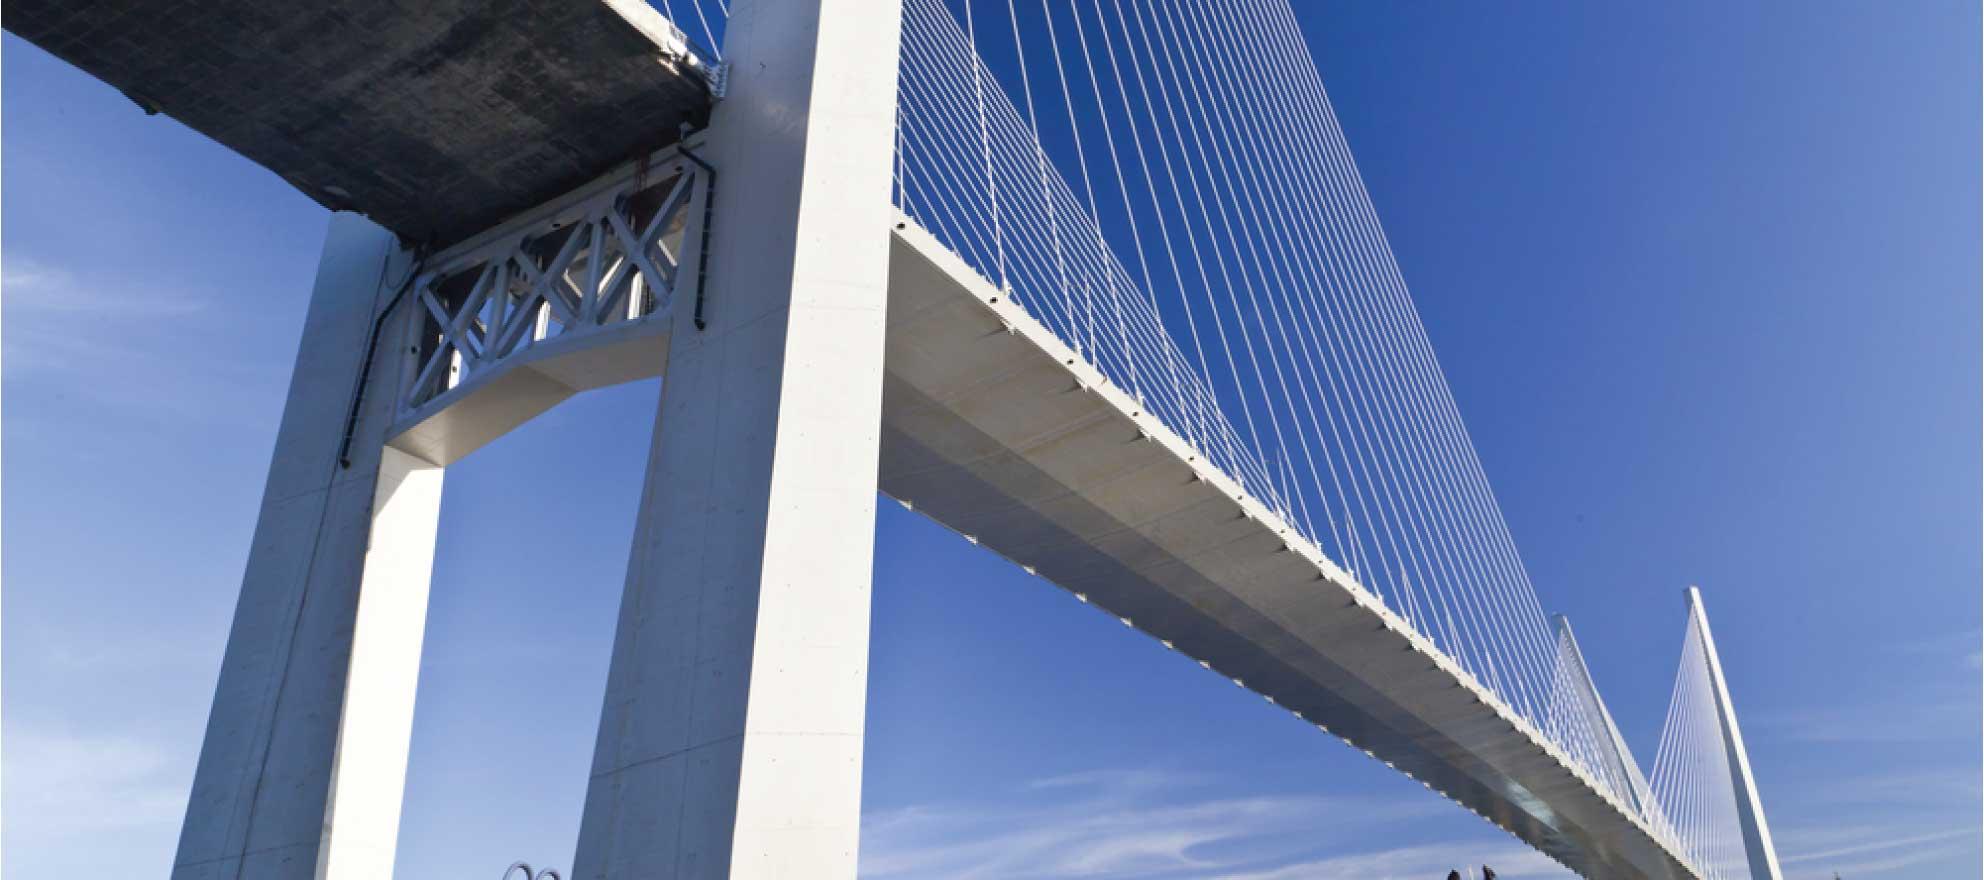 Online portal serves as marketing bridge for referral partners